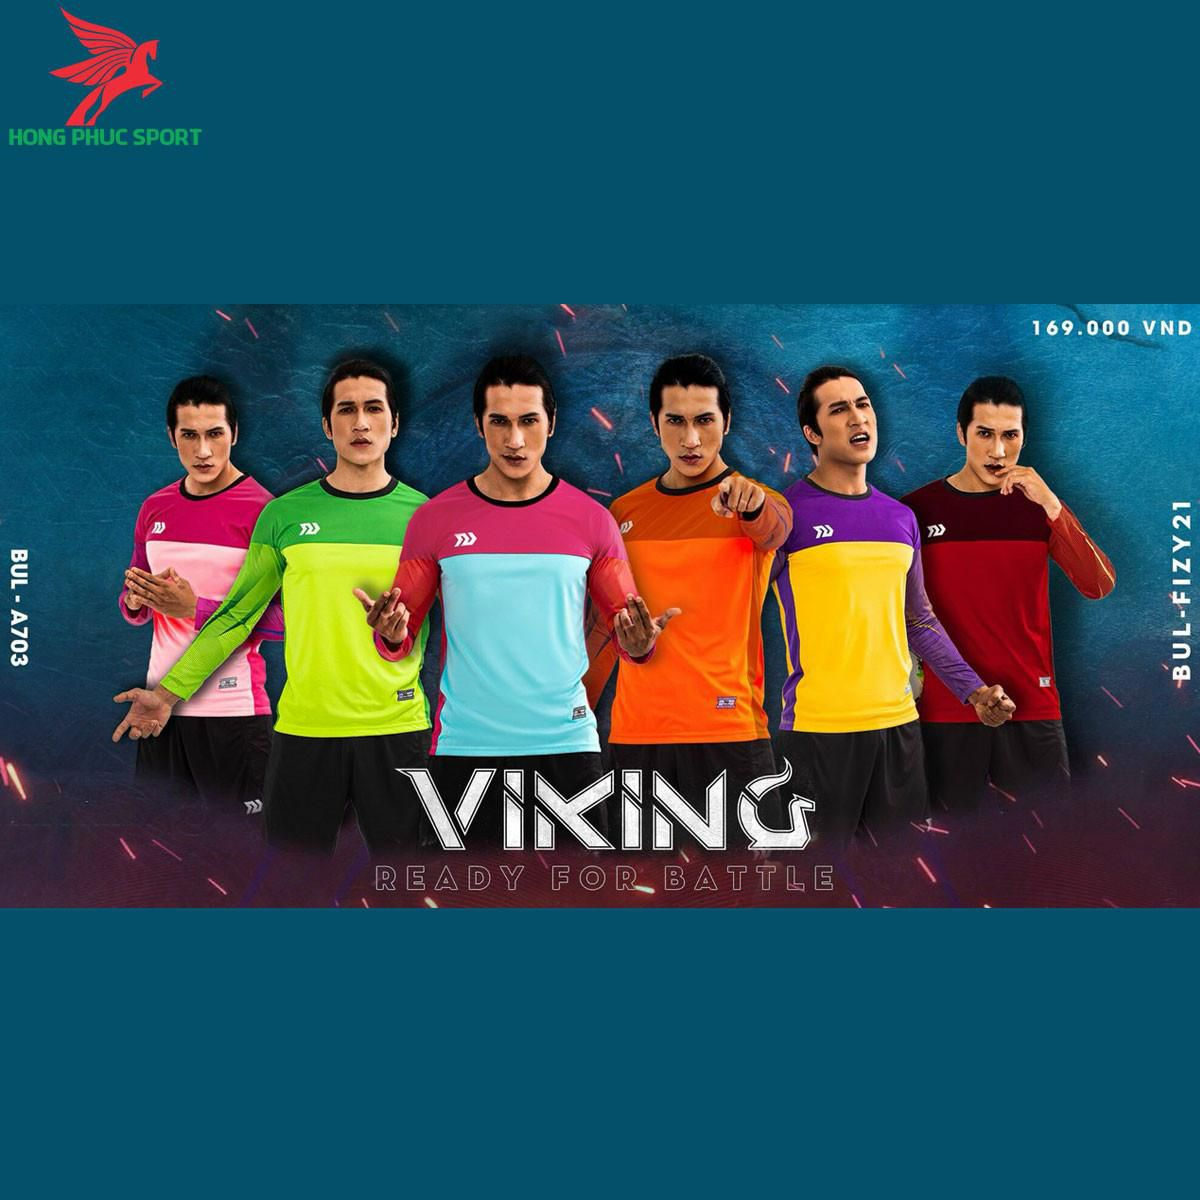 https://cdn.hongphucsport.com/unsafe/s4.shopbay.vn/files/285/ao-thu-mon-khong-logo-bulbal-viking-2-60515cd784d68.jpg